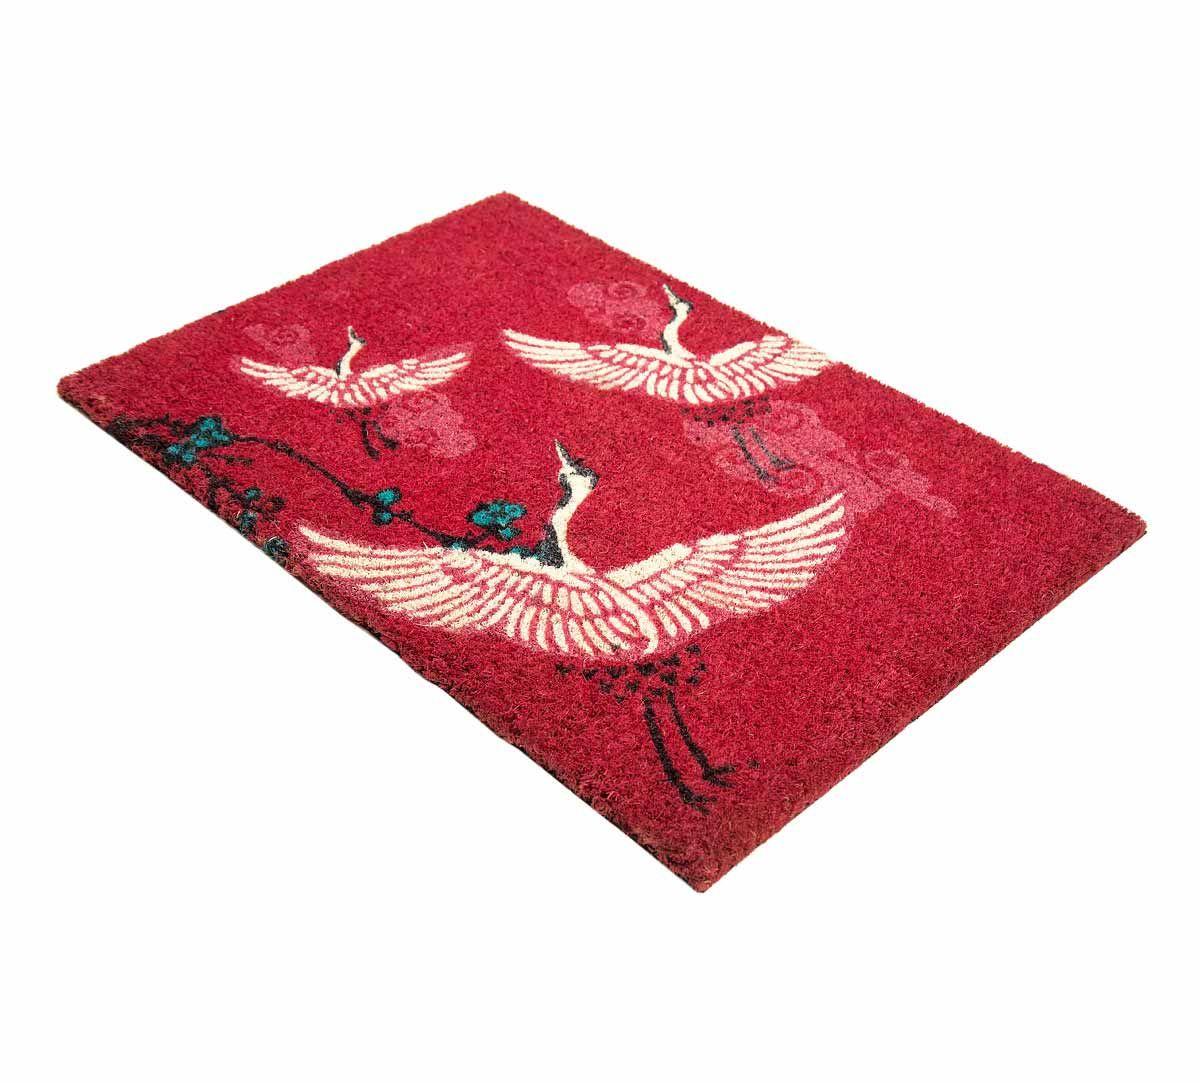 India Circus Legend of the Cranes Red Doormat